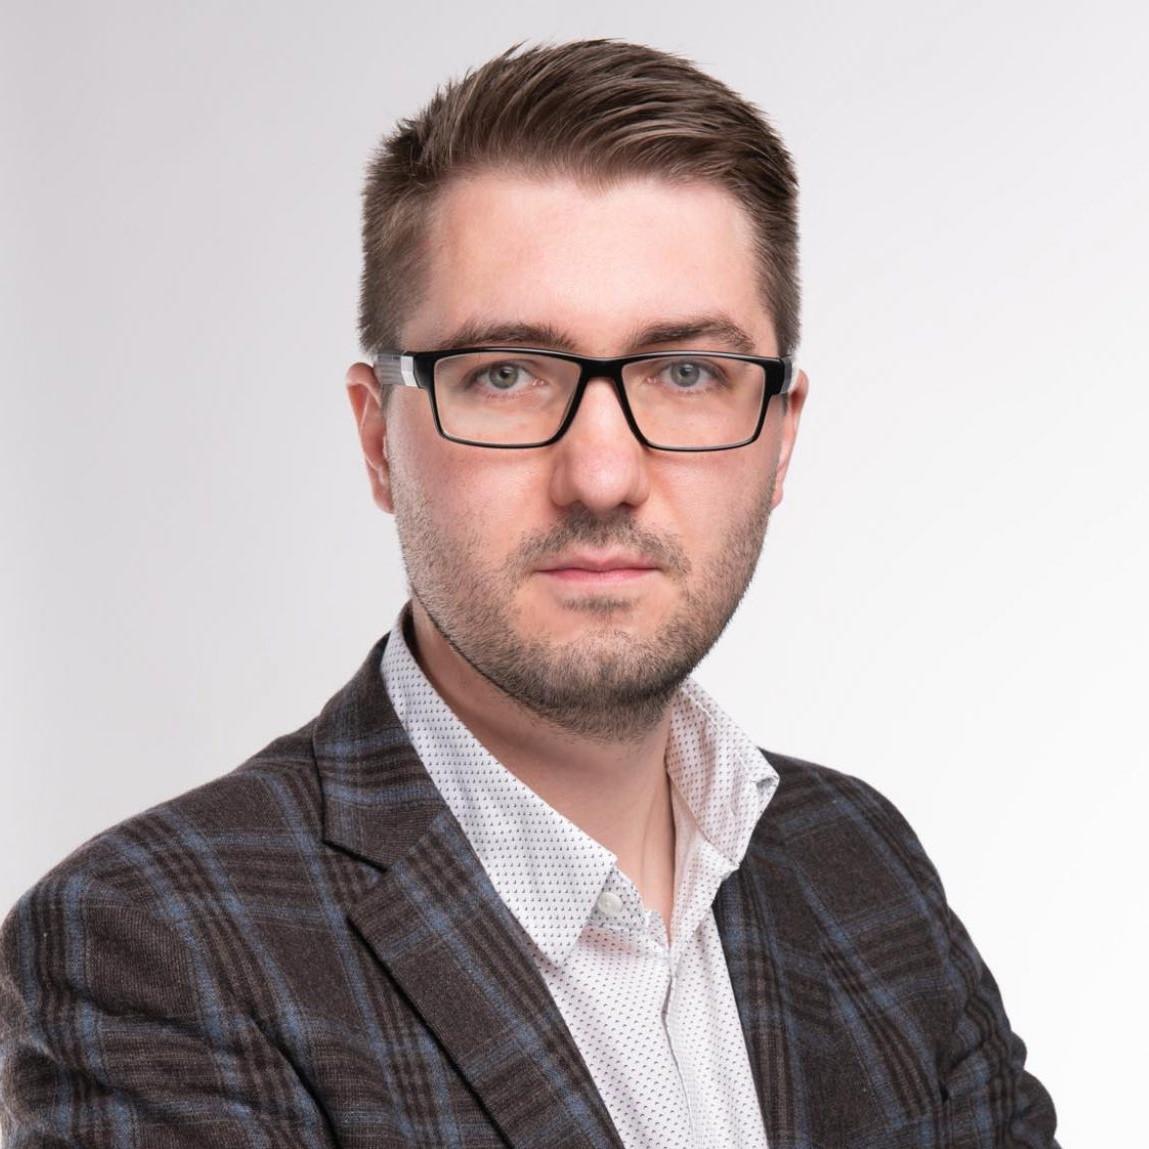 Олександр Майданюк